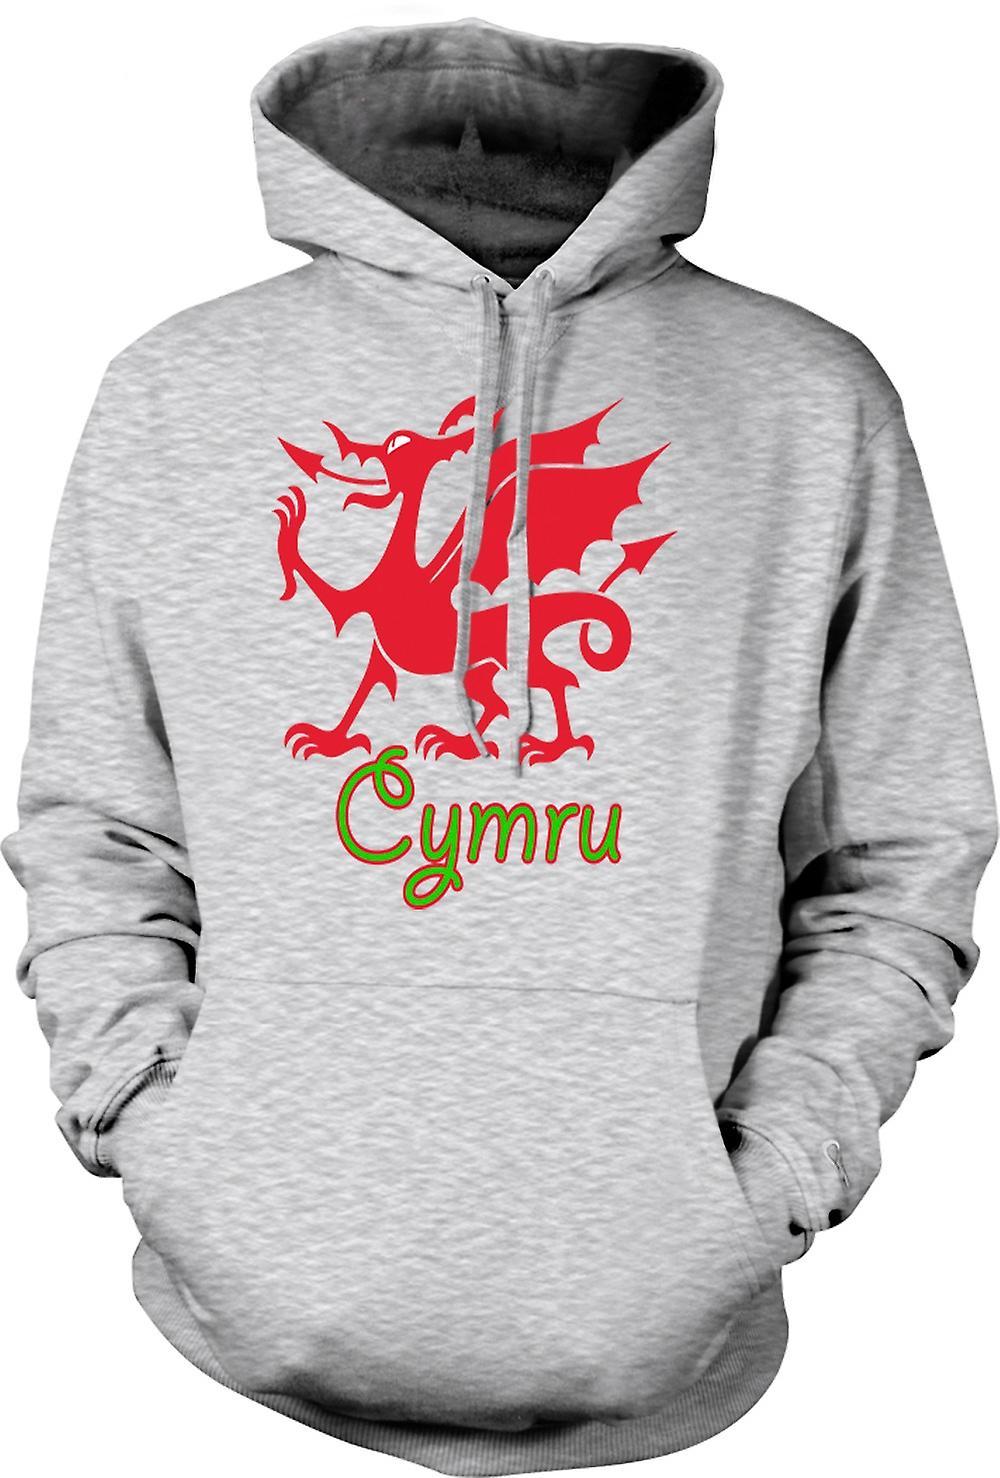 Mens hettegenser - walisiske dragen - Cymru